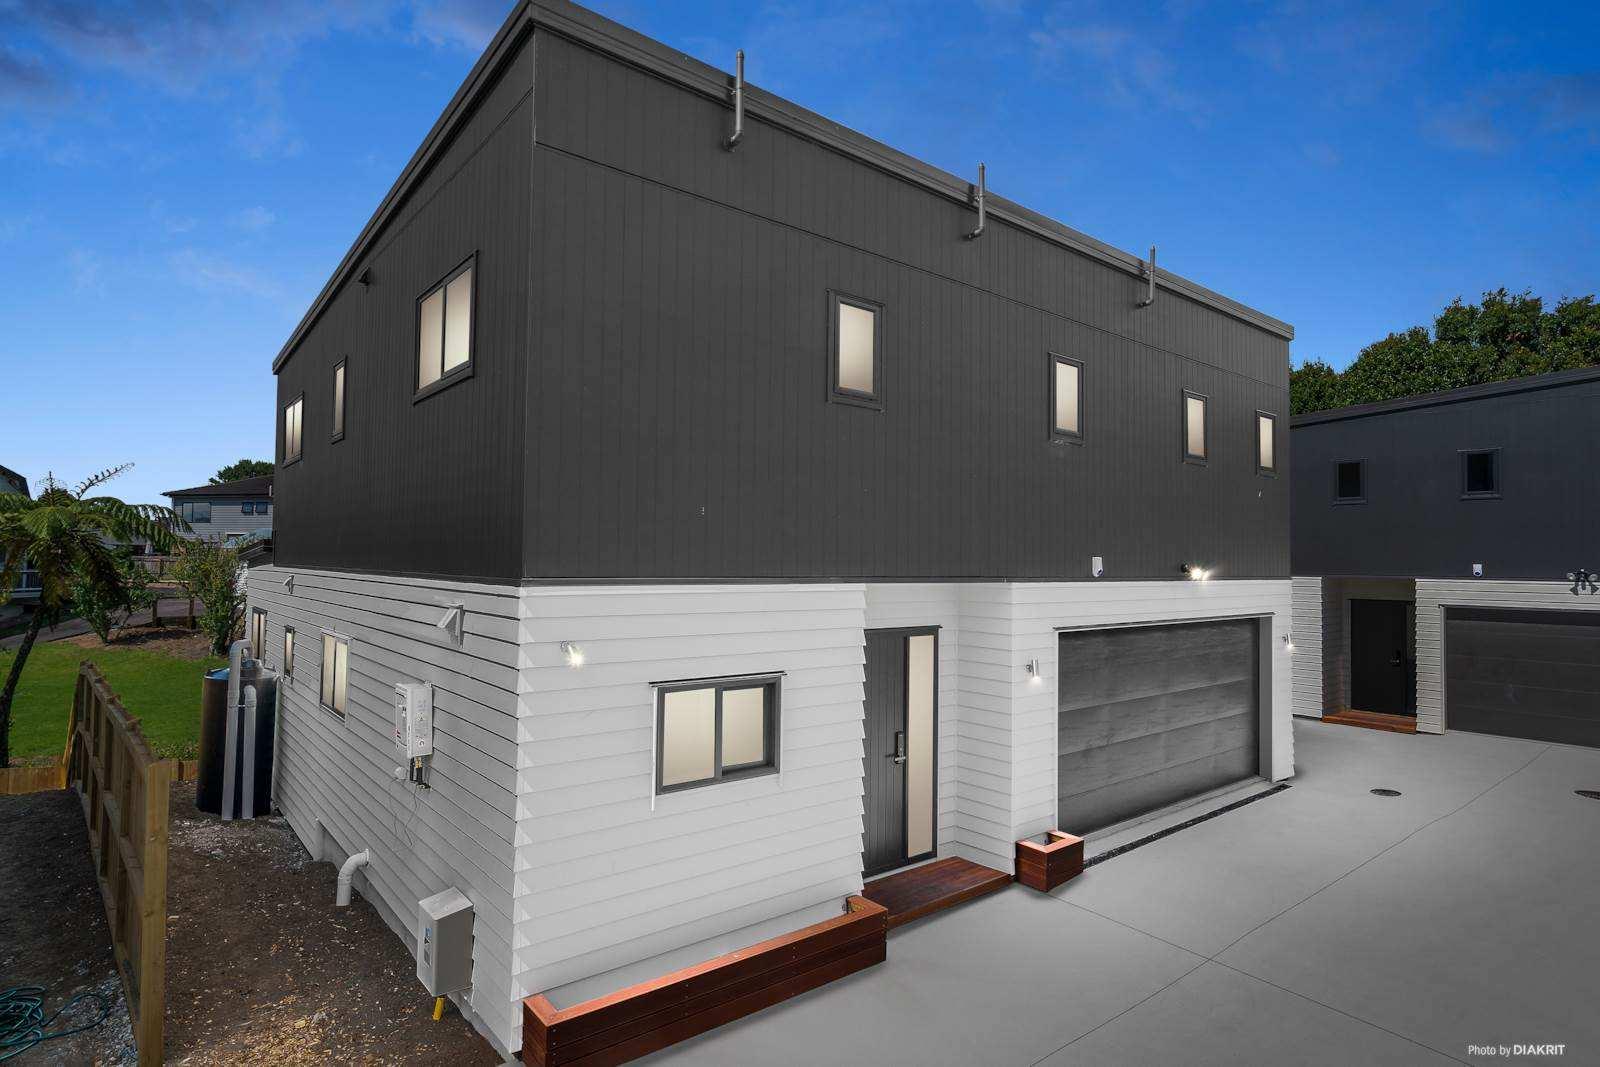 Te Atatu South 5房 四套全新美宅 外墙坚固 车位充足 四季温馨宜居 给您一个浪漫的家! 4 BRAND NEW HOMES ! FREEHOLD